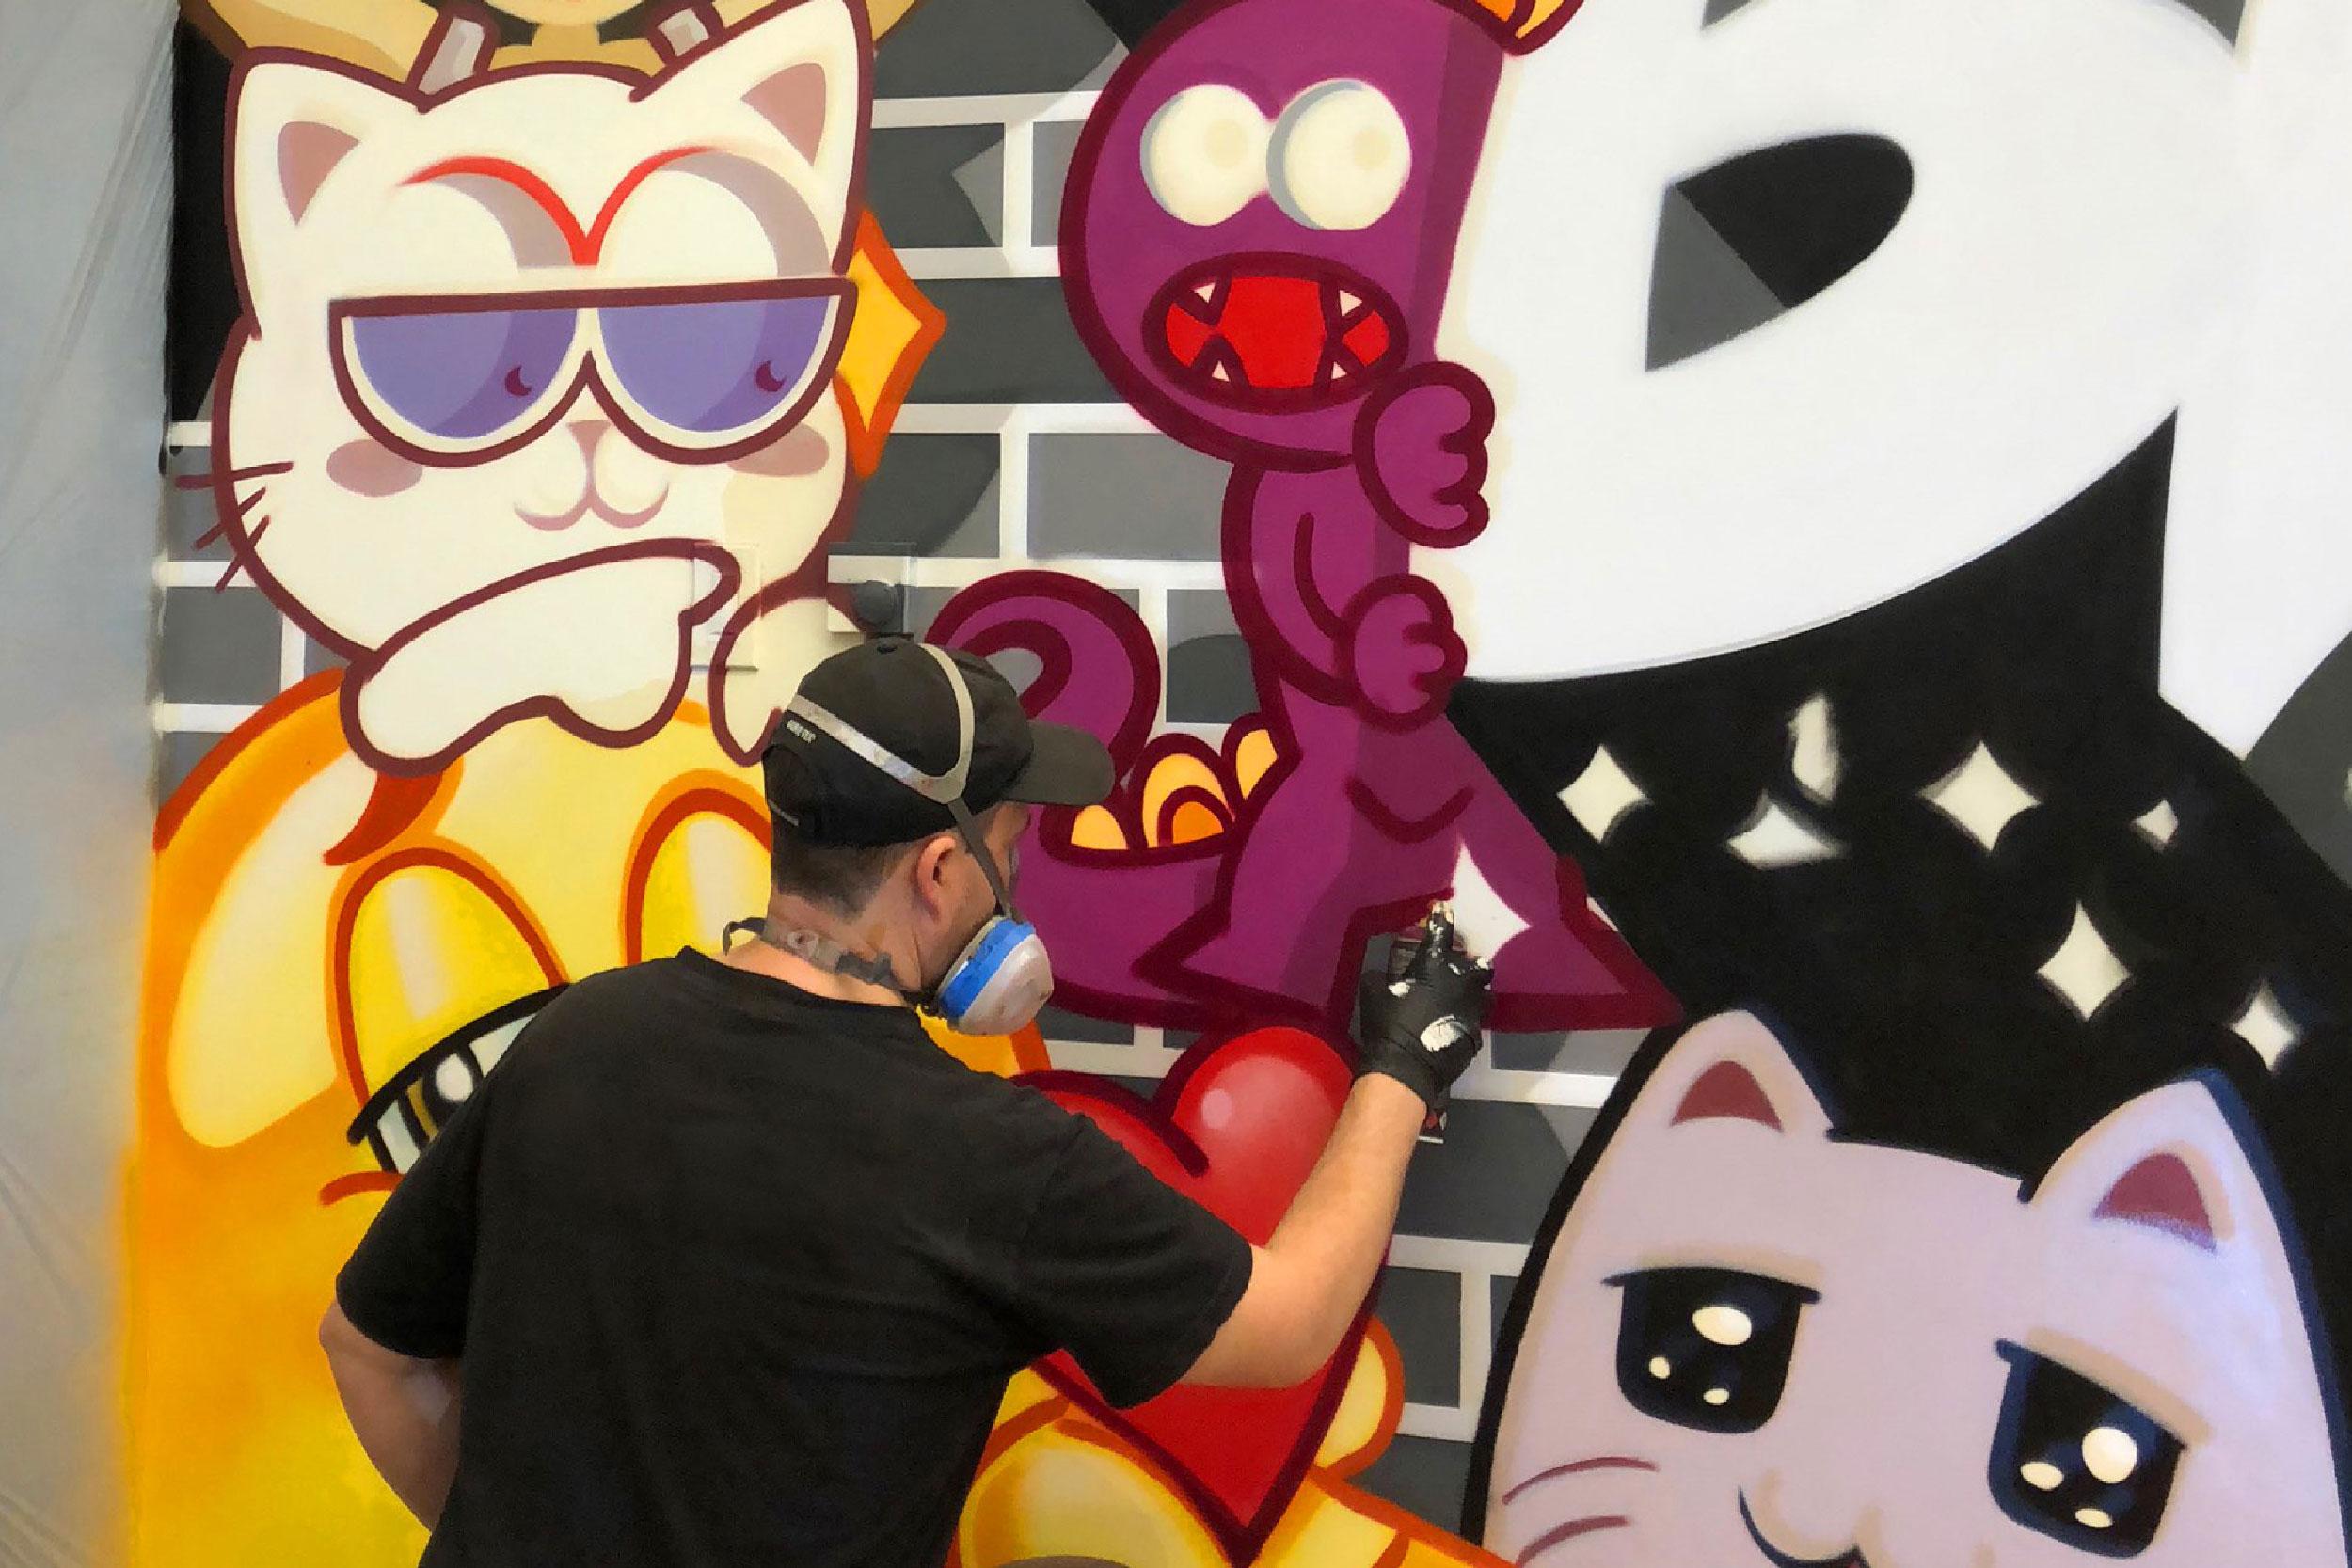 graffiti-artist-office-mural-san-francisco_02.jpg